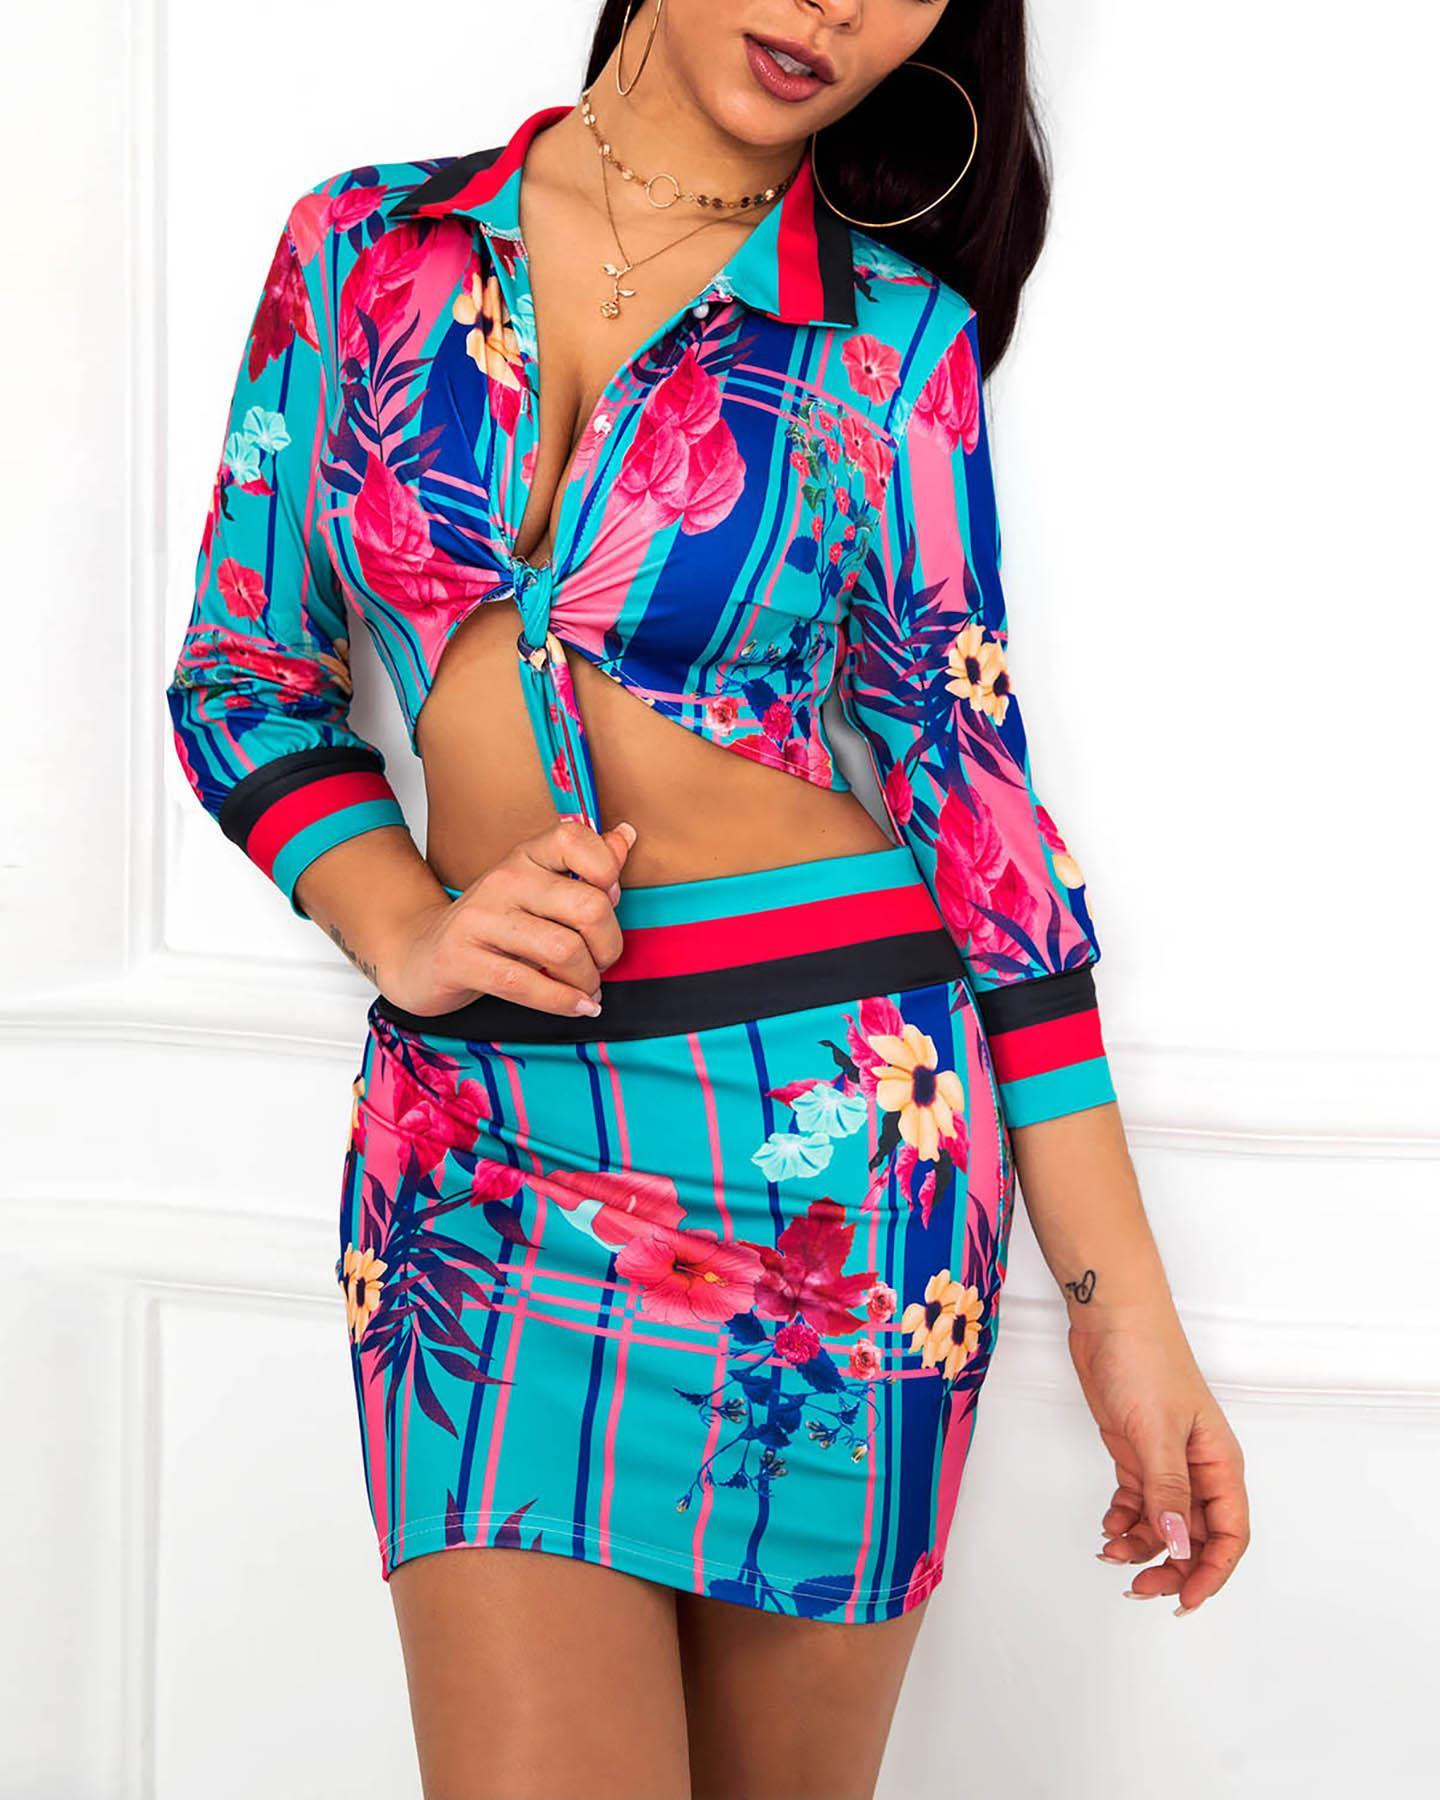 chicme / Floral Print Striped Insert Crop Top & Skirt Set